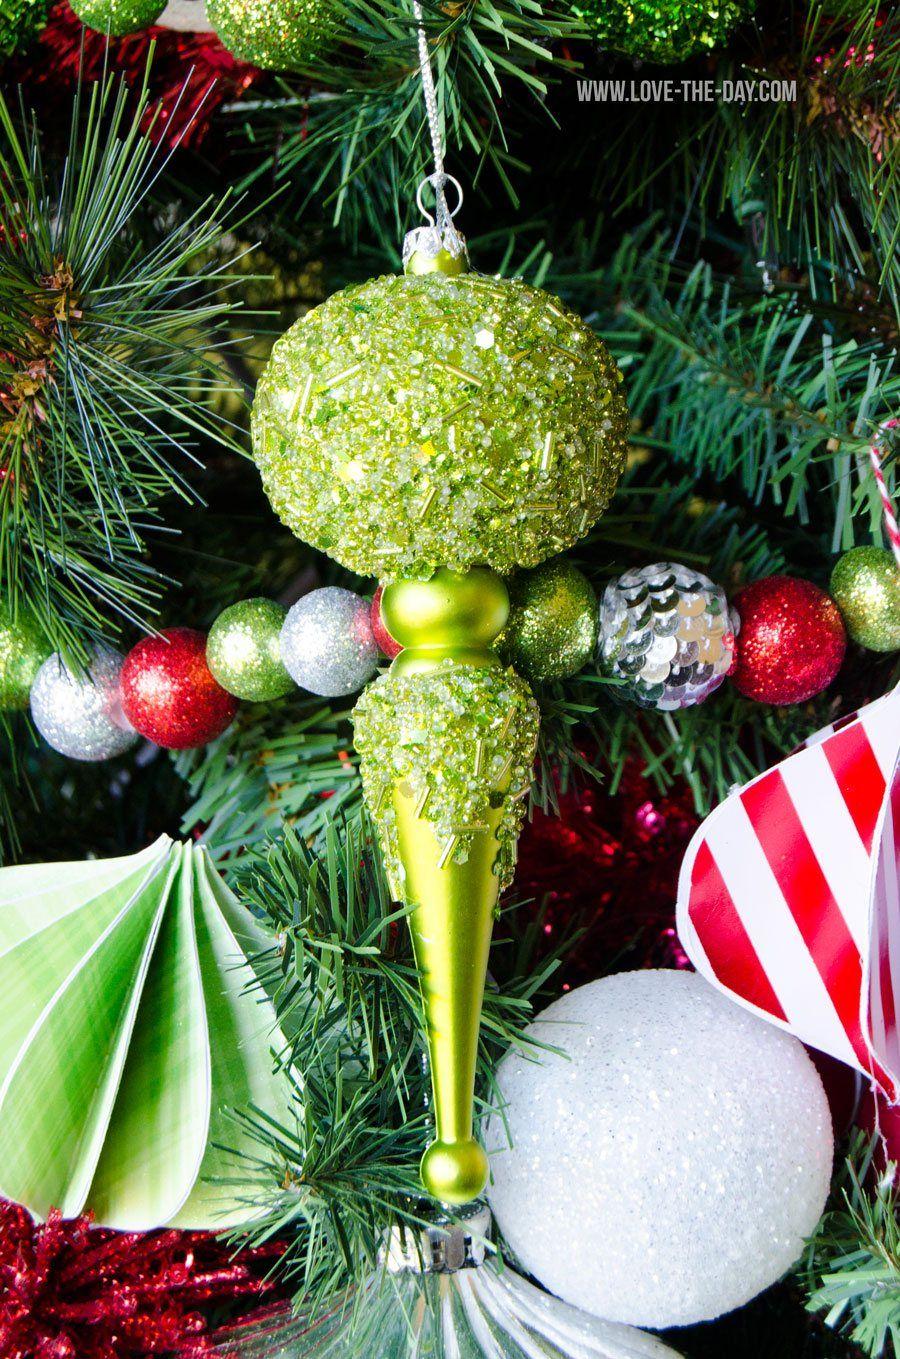 Whimsical Christmas Tree Decorating Ideas Michaels Makers Whimsical Christmas Trees Whimsical Christmas Christmas Tree Decorations